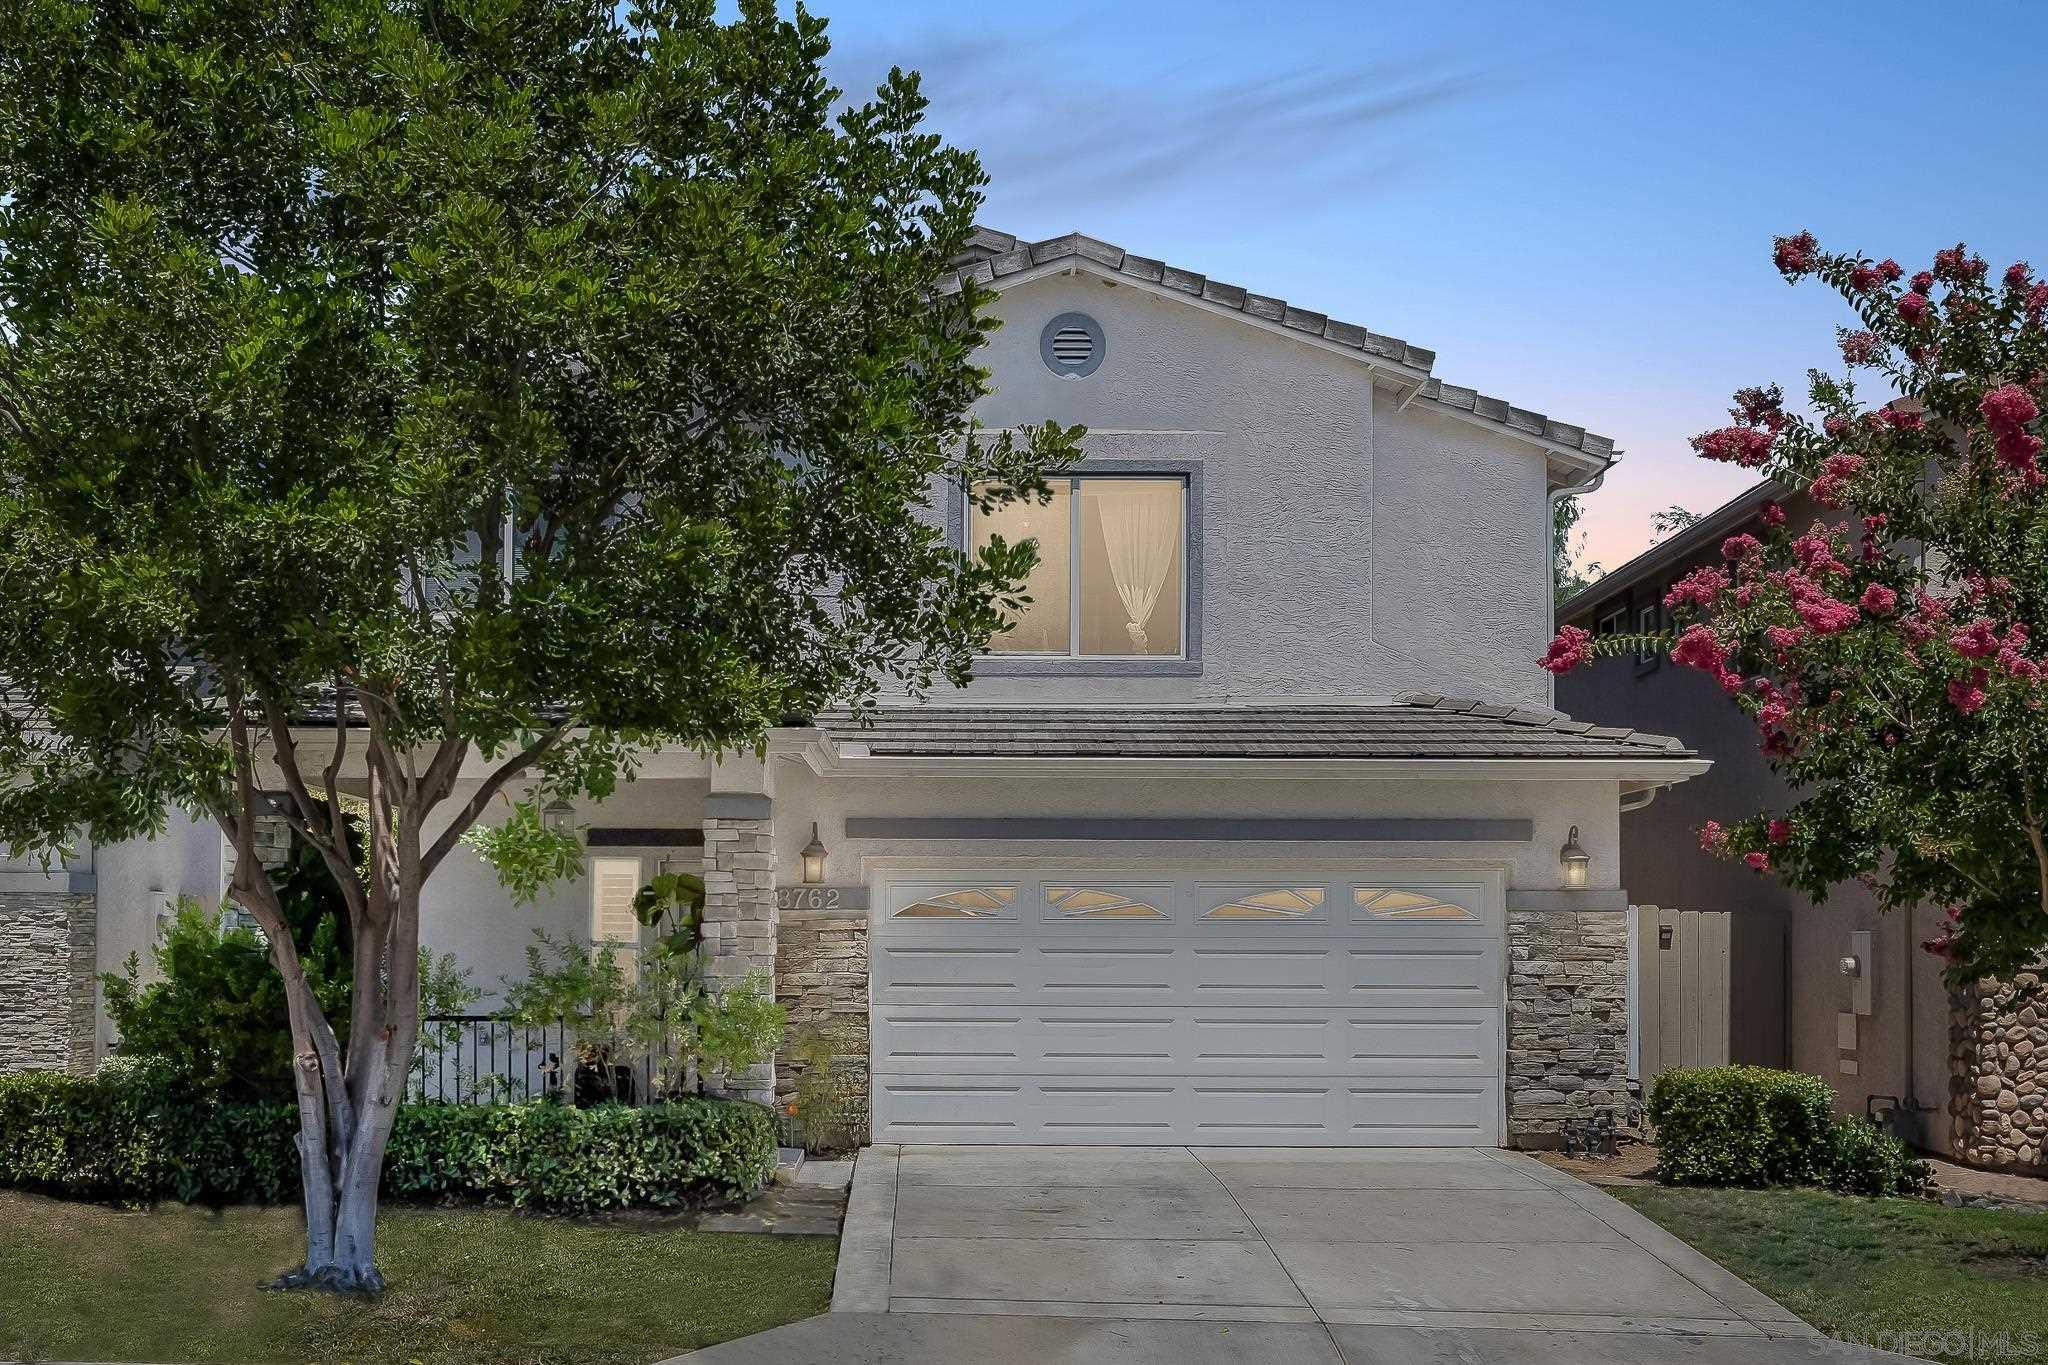 8762 Glen Vista Way, Santee, CA 92071